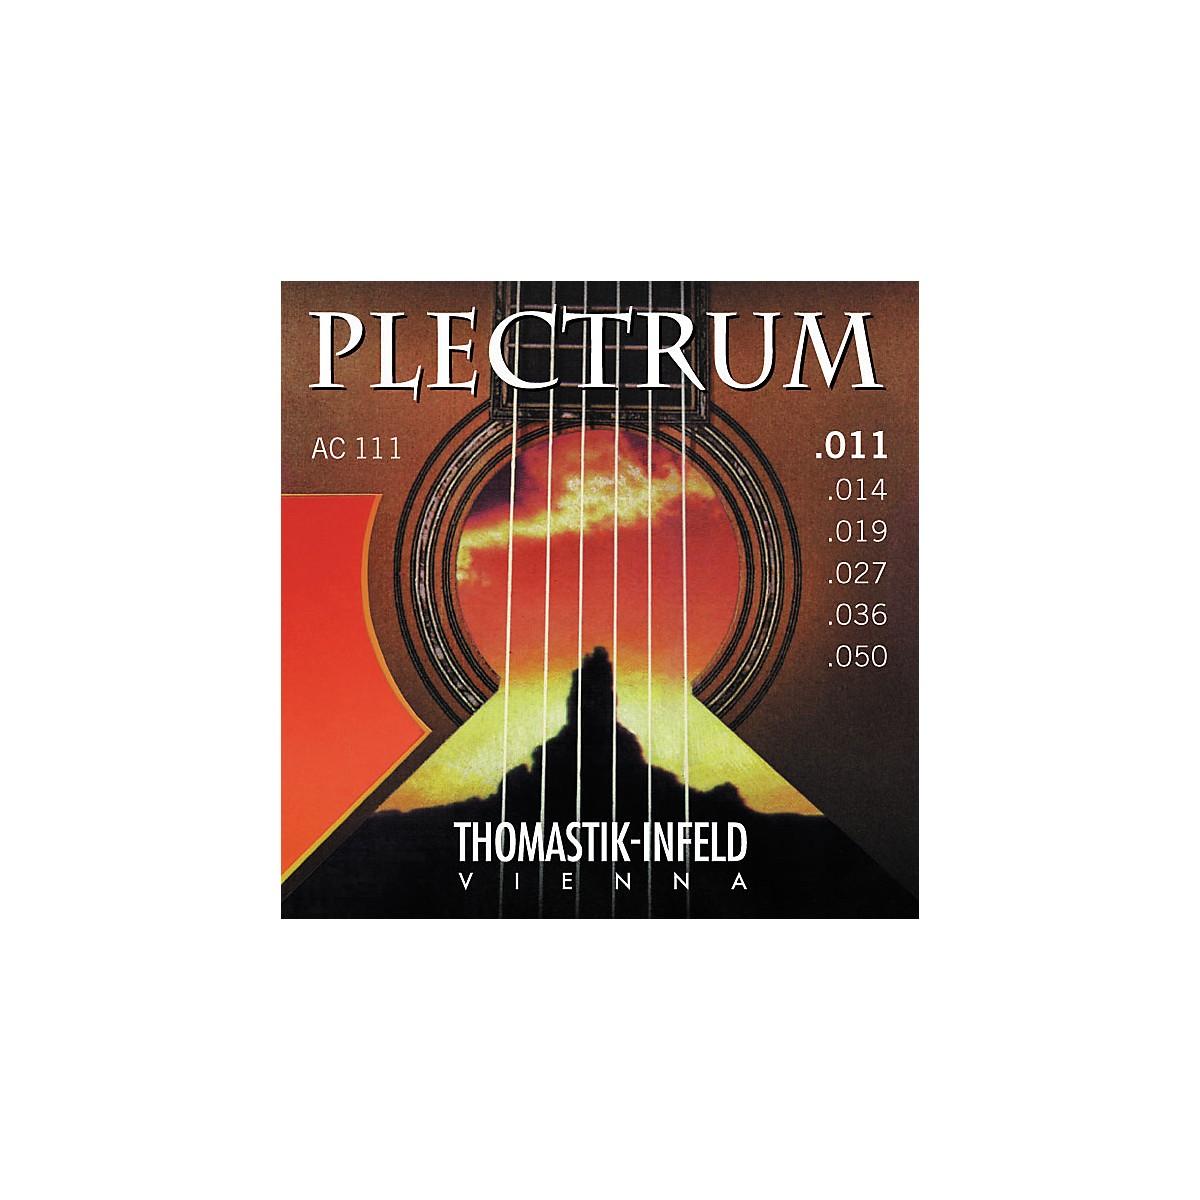 Thomastik AC111 Plectrum Bronze Acoustic Guitar Strings - Light